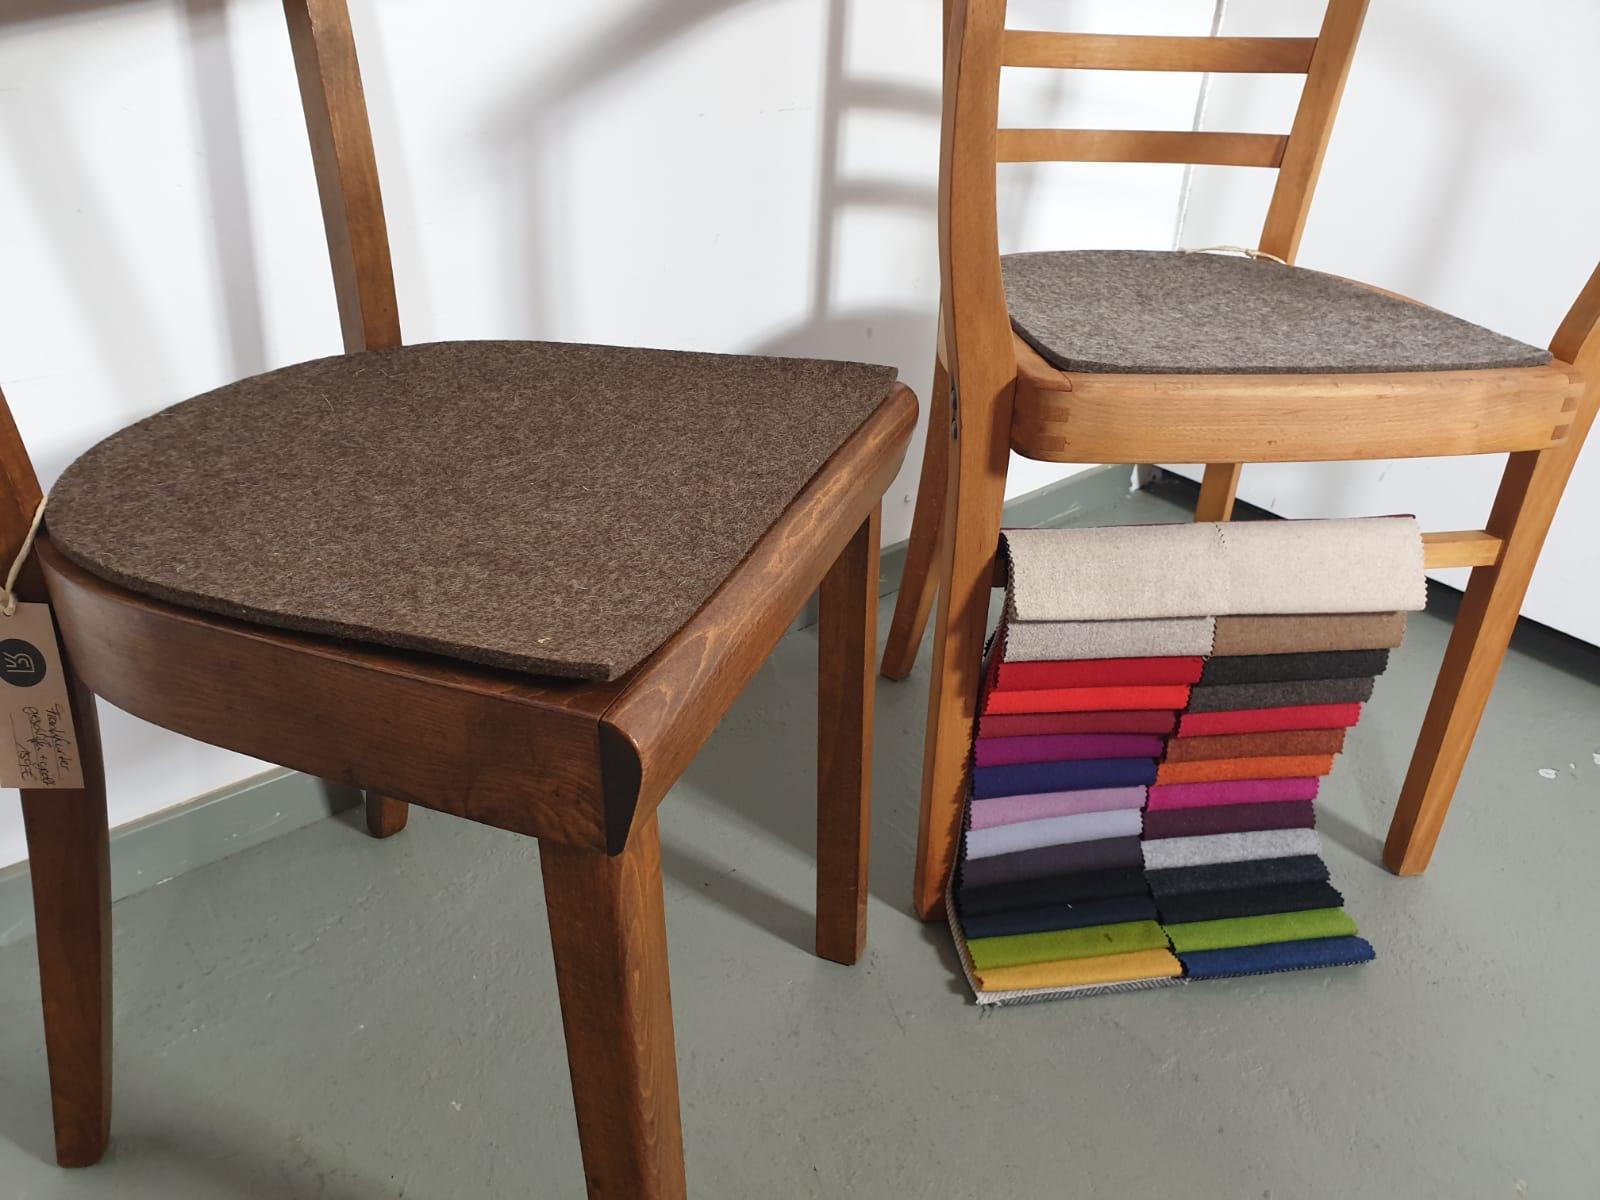 Antike Polsterstoffe Antike Stühle Polsterstoffe ...